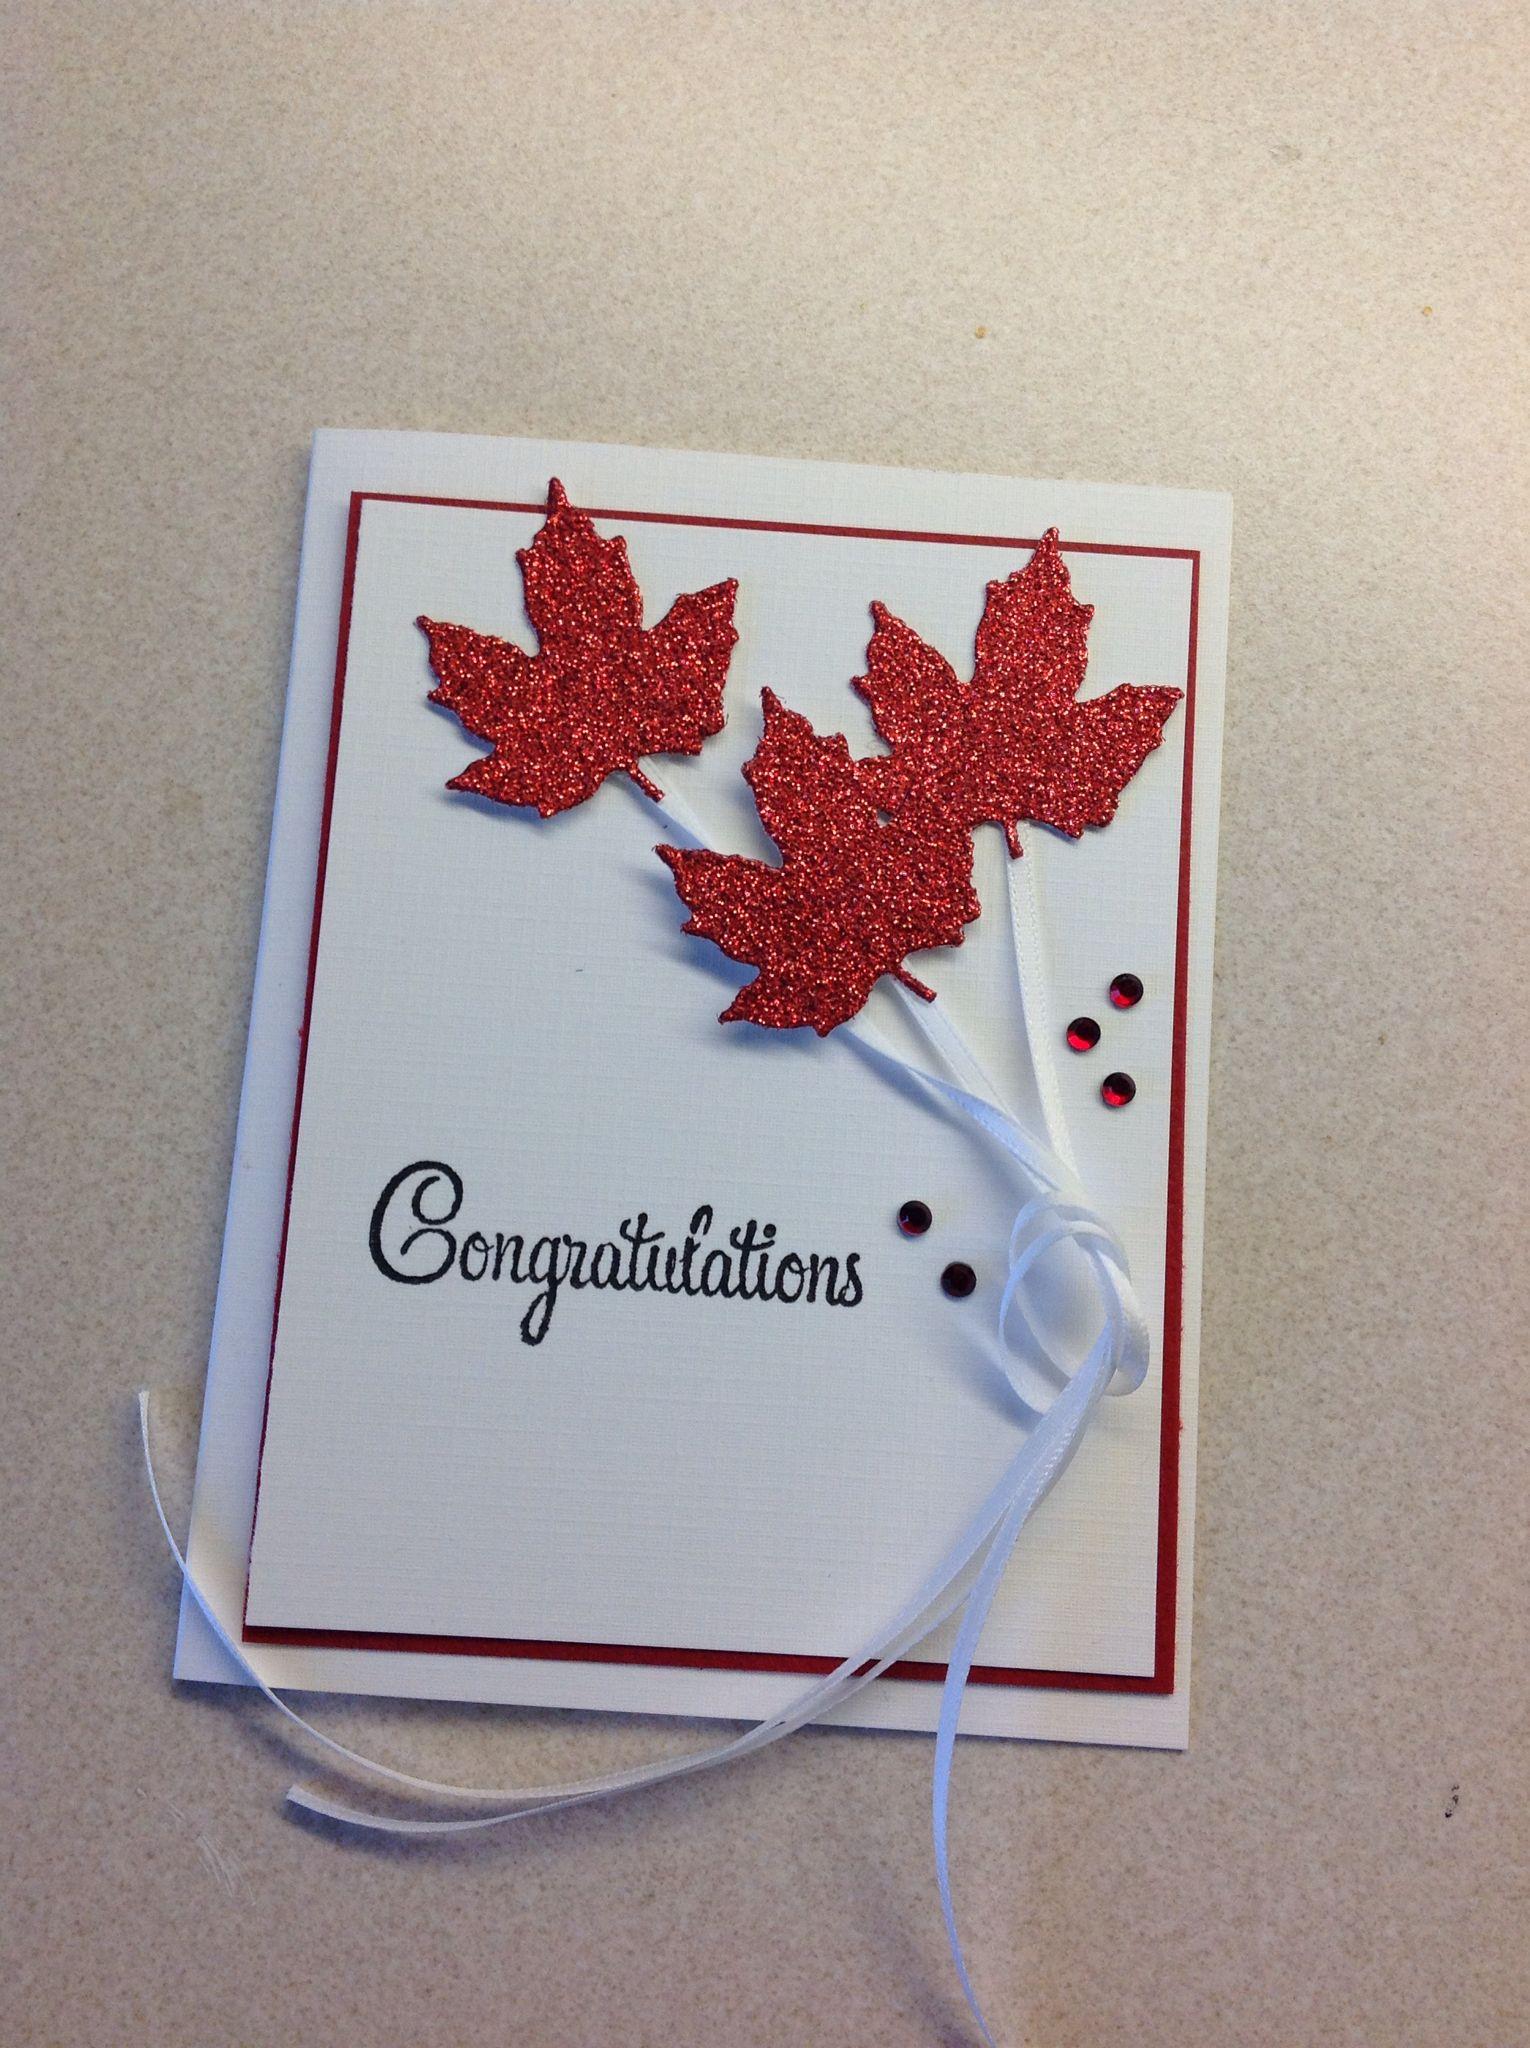 Congratulations On Becoming A Canadian Citizen Card Congratulations Card Congratulations Greetings Cards Handmade